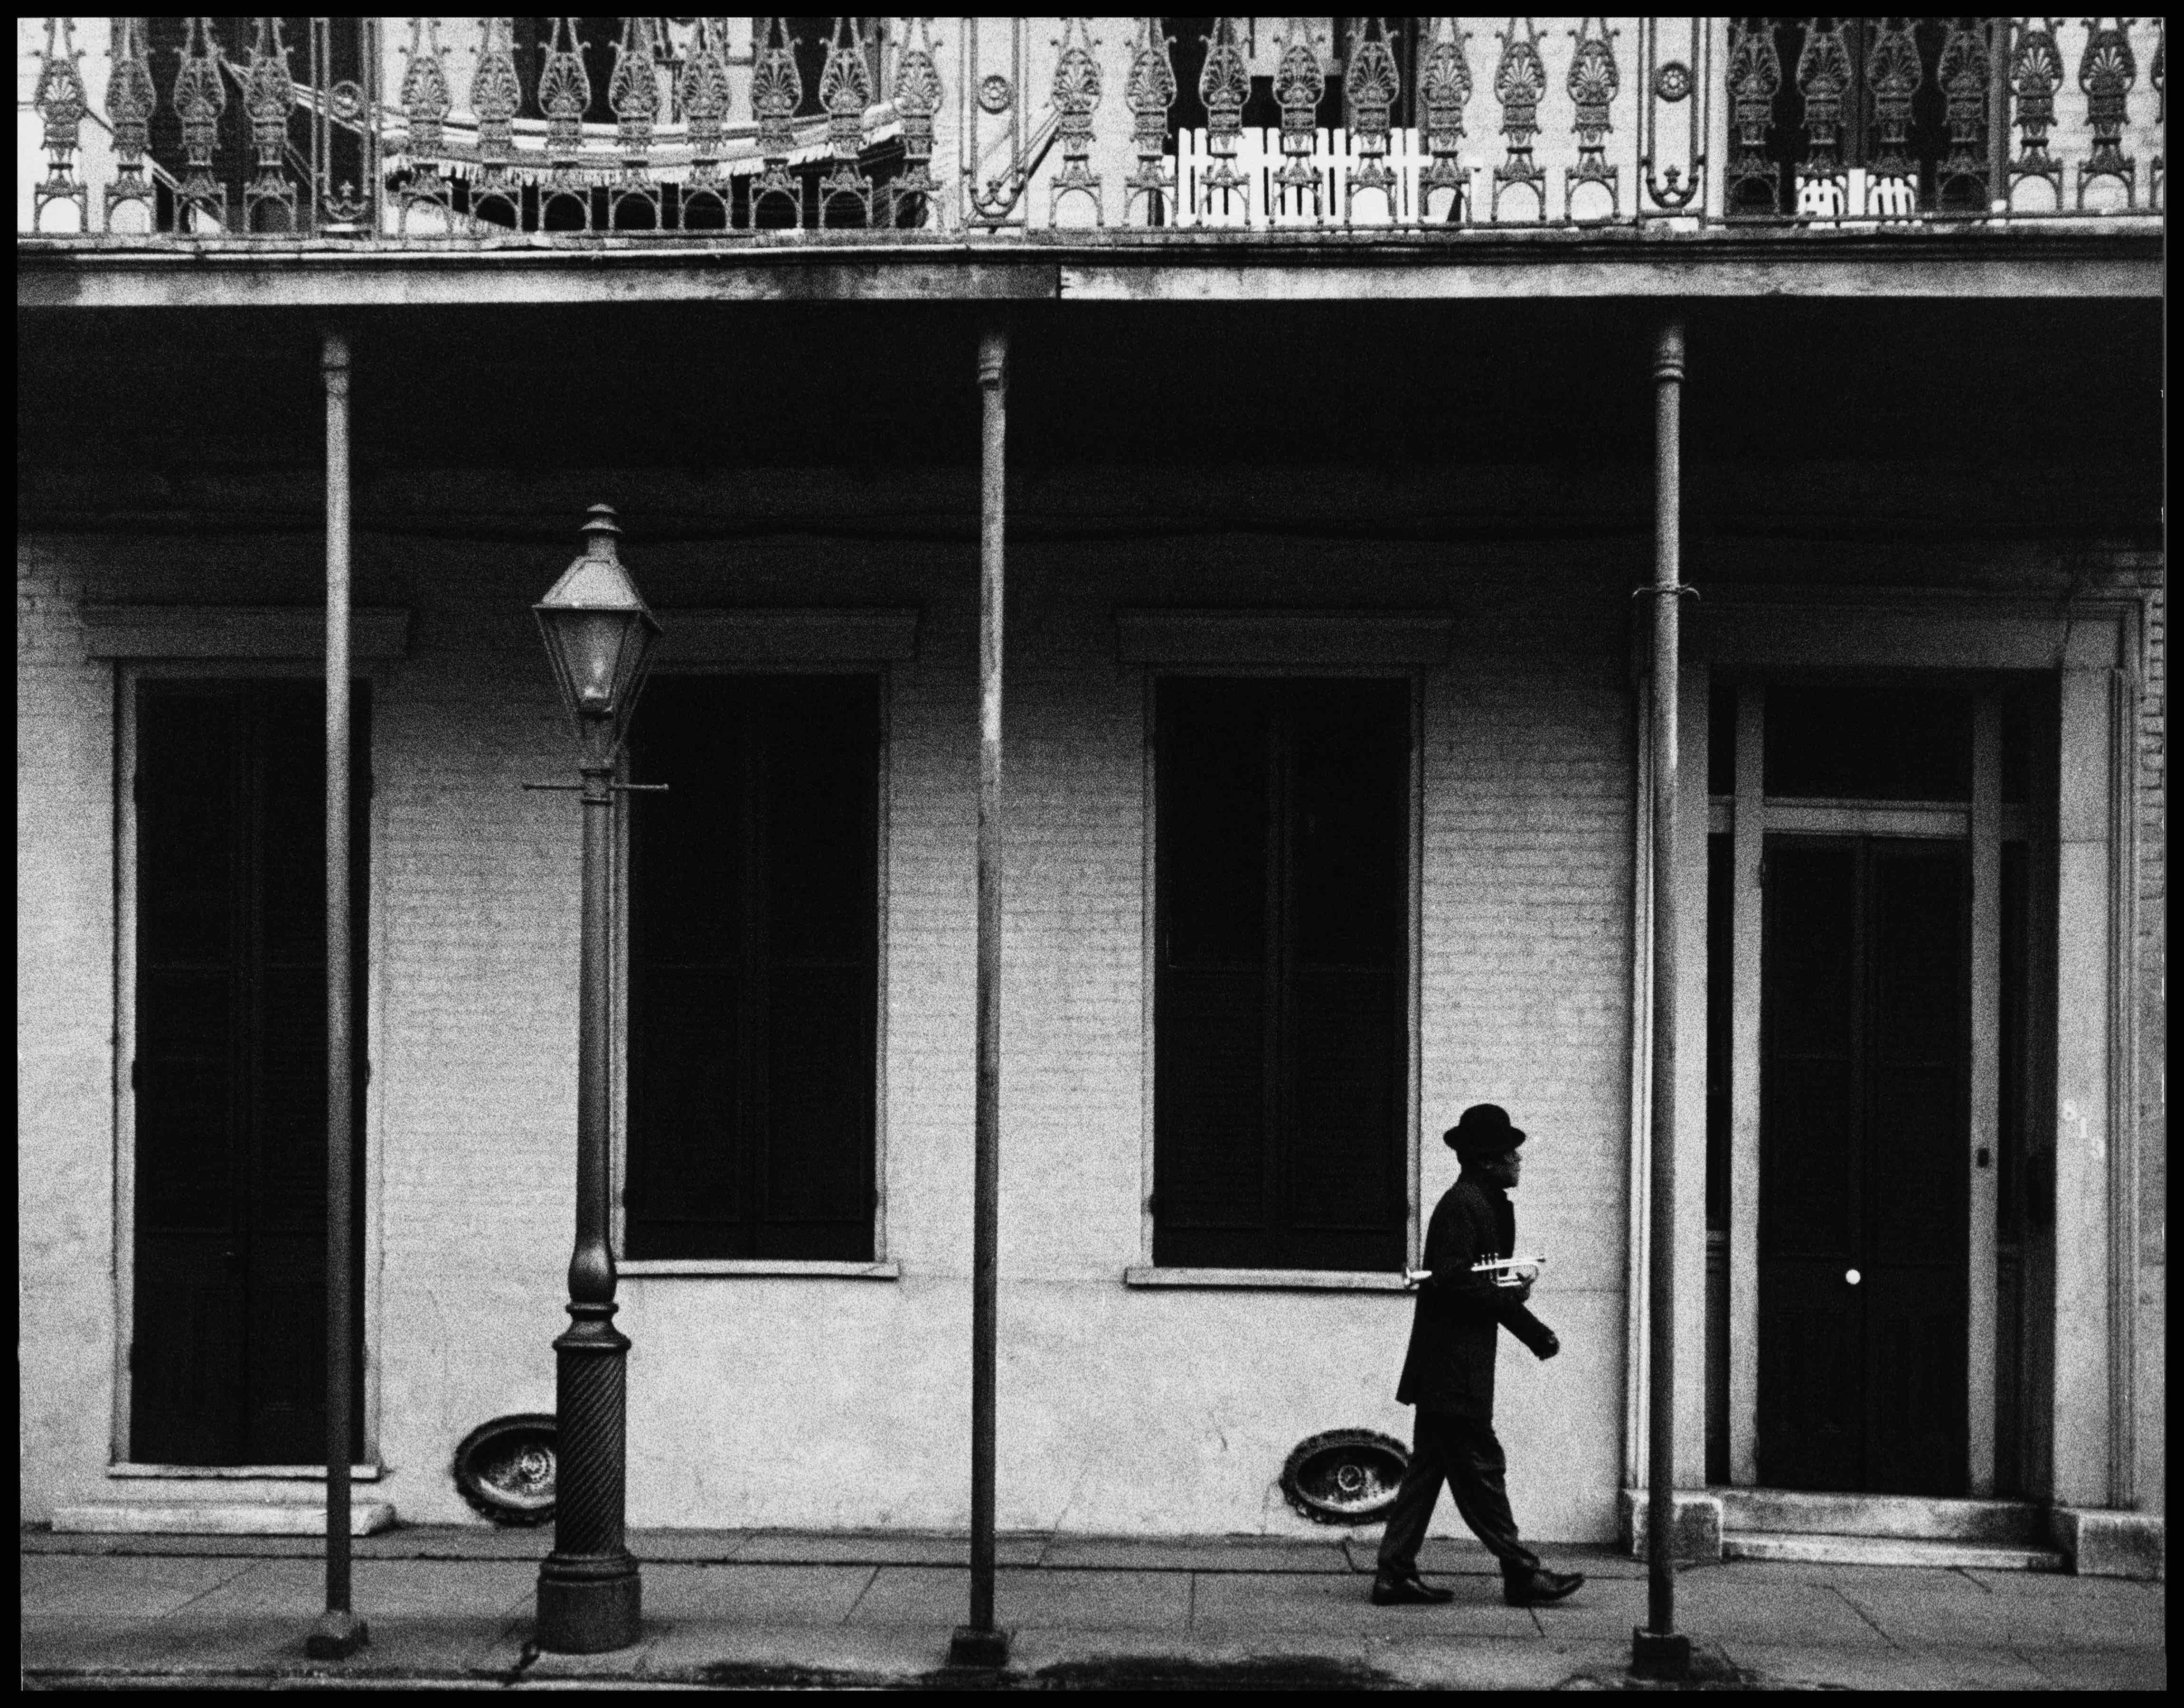 USA. New Orleans, Louisiana. 1958. Ernest MILLER nicknamed Kid Punch MILLER trumpet player and singer returning home at 6 am. © Dennis Stock / Magnum Photos